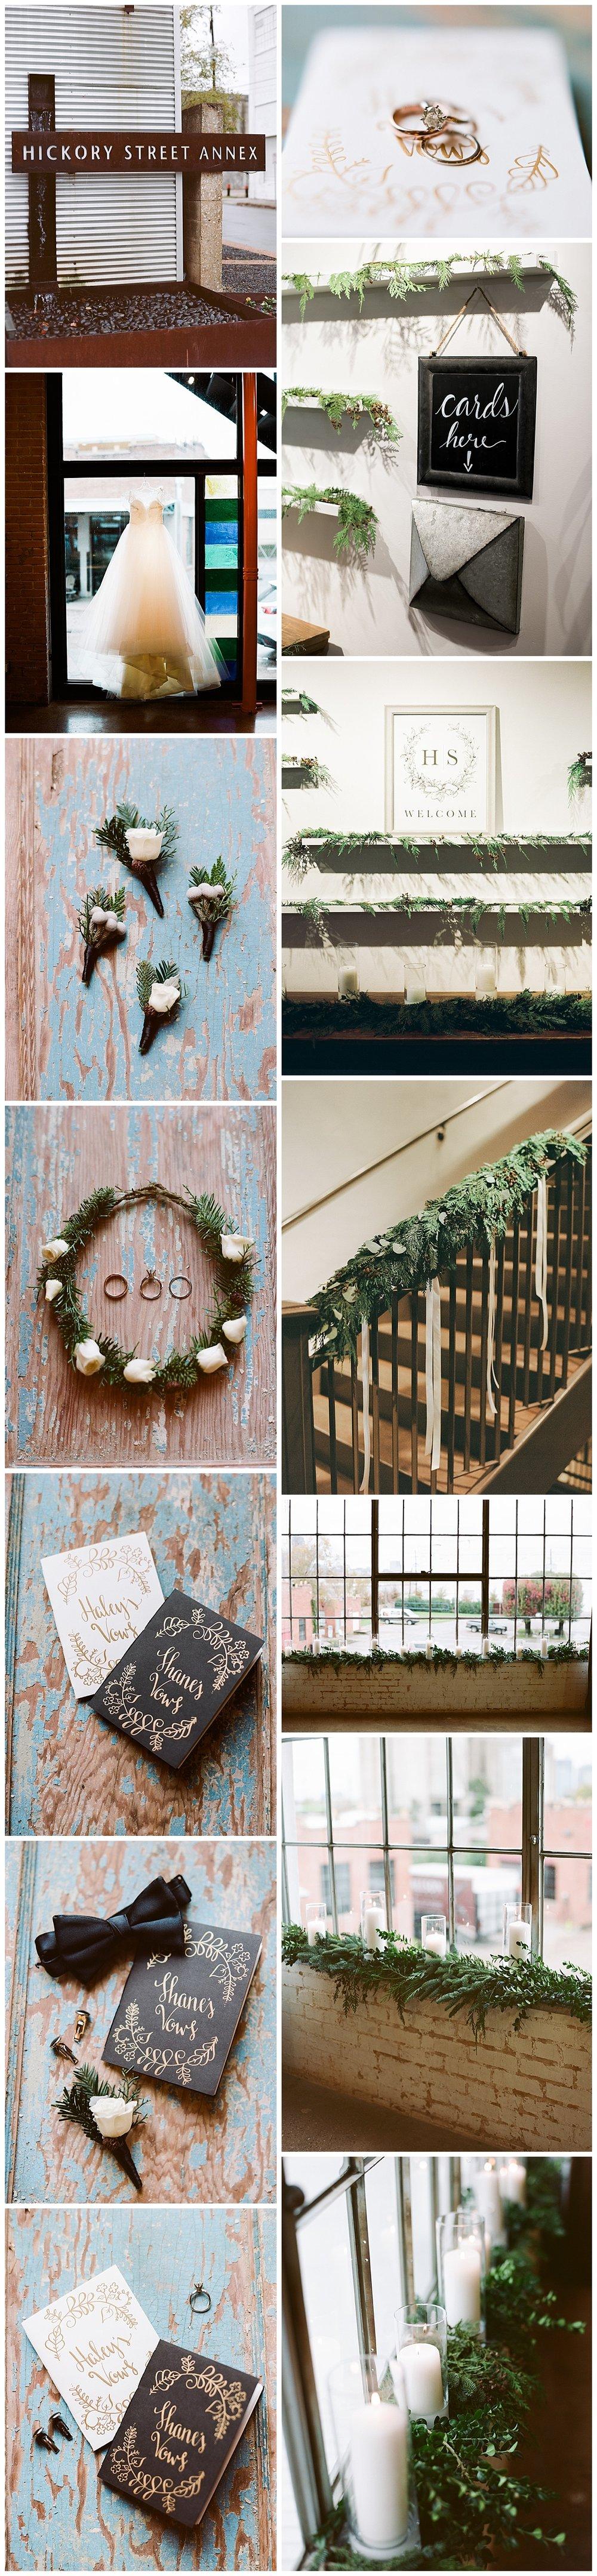 hickory-street-annex-wedding-ar-photography-1.jpg